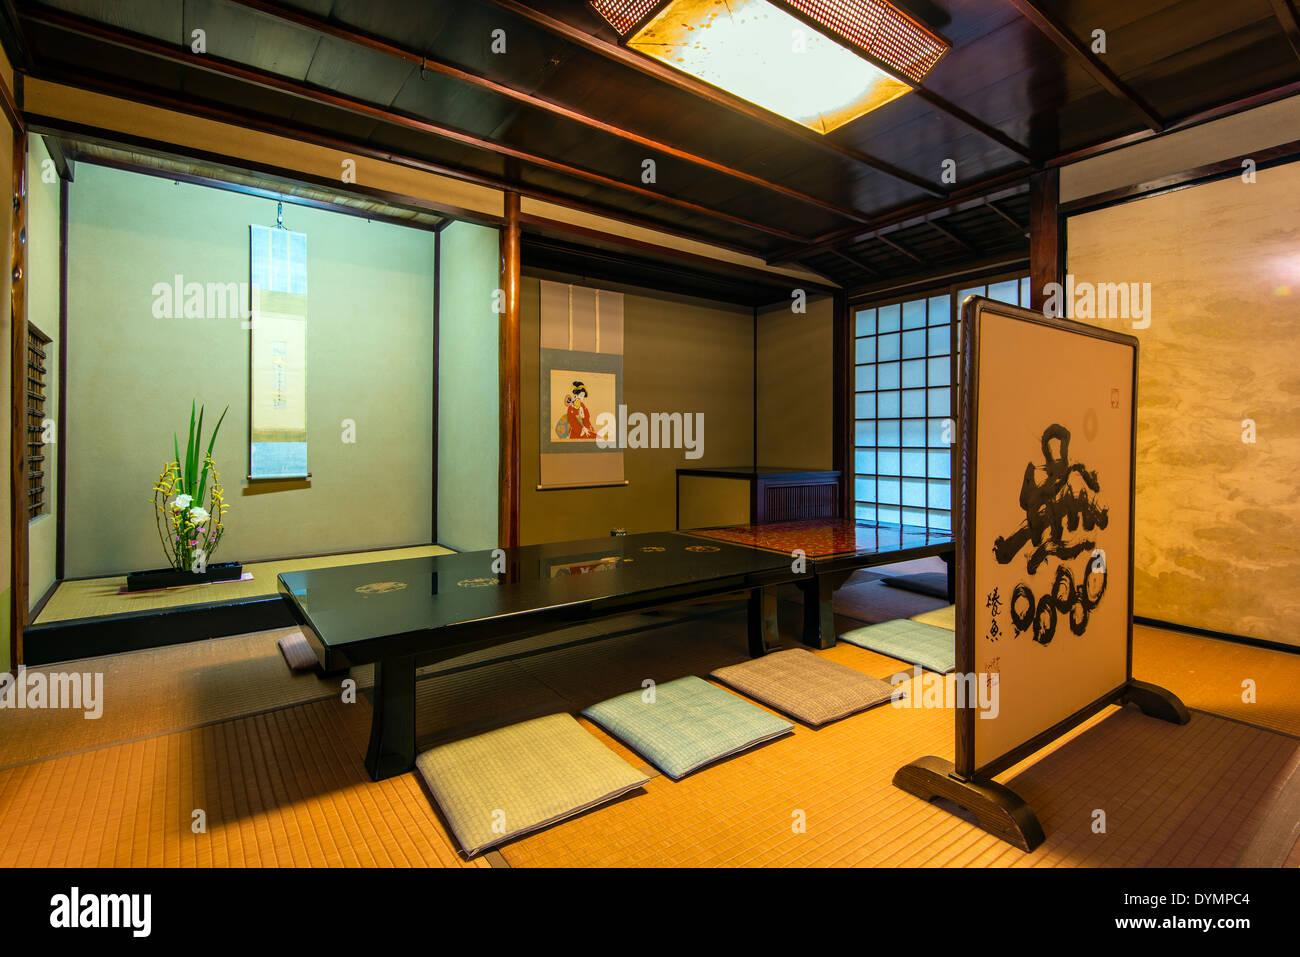 Tea room at Kaikaro geisha house dated early 19th century, Higashi Chayagai district, Kanazawa, Ishikawa Prefectur, Japan - Stock Image